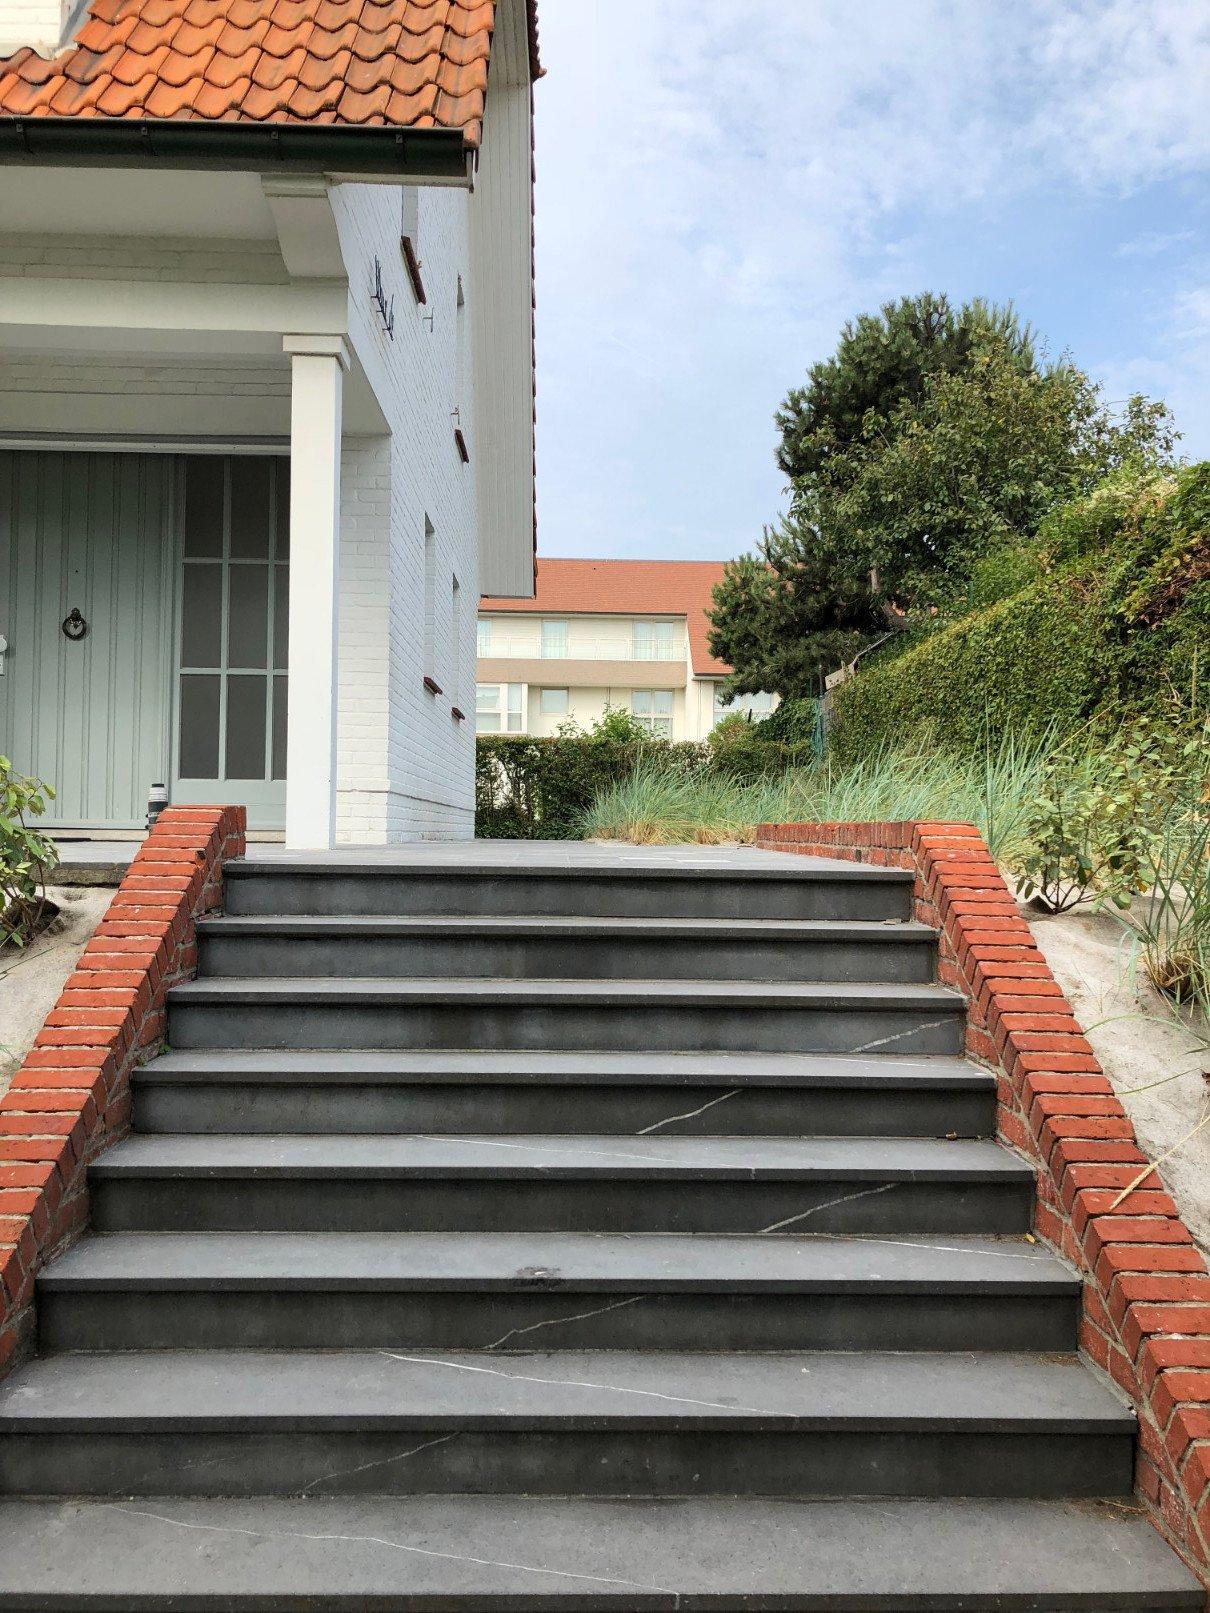 Rietveldprojects-Villa Were Di - Te Koop : Te Huur (per week)20